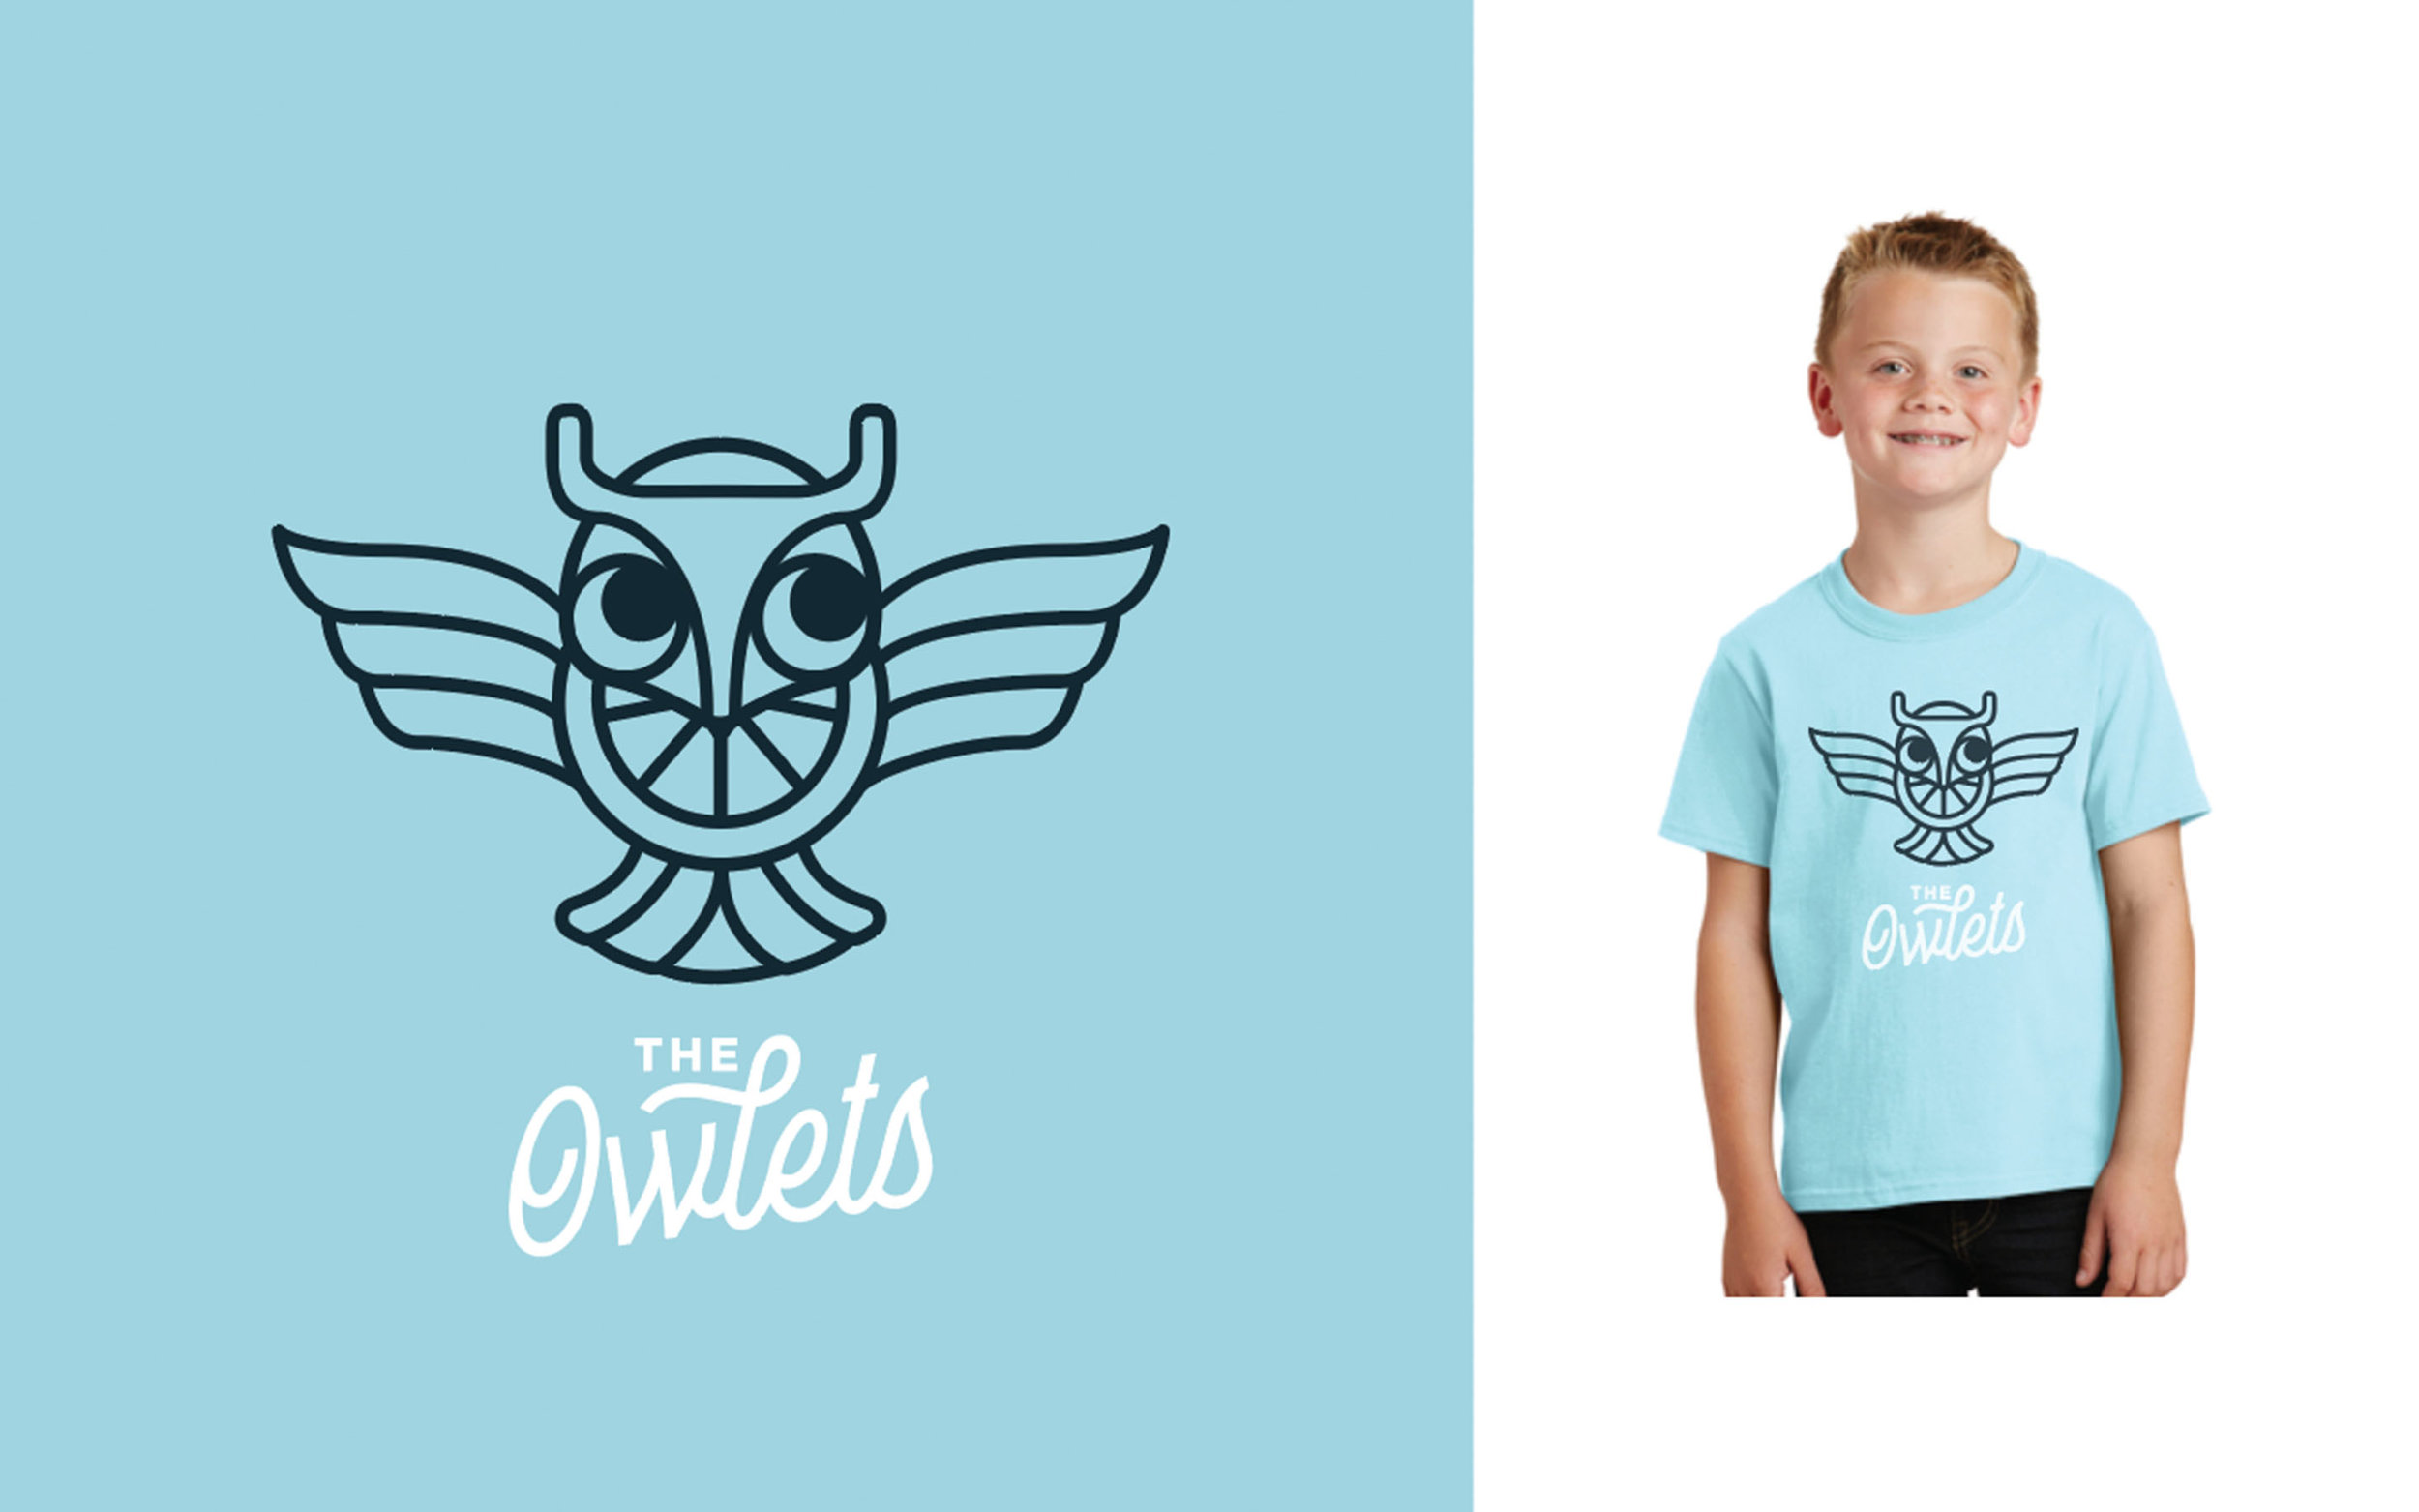 Fruitful Design Strategy Omaha Nebraska Owl Ride The Owlets.jpg